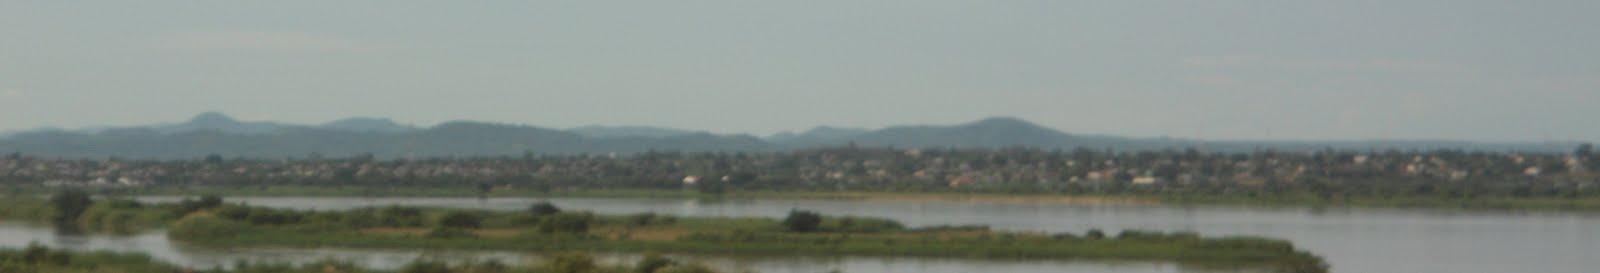 Sobre o Zambeze